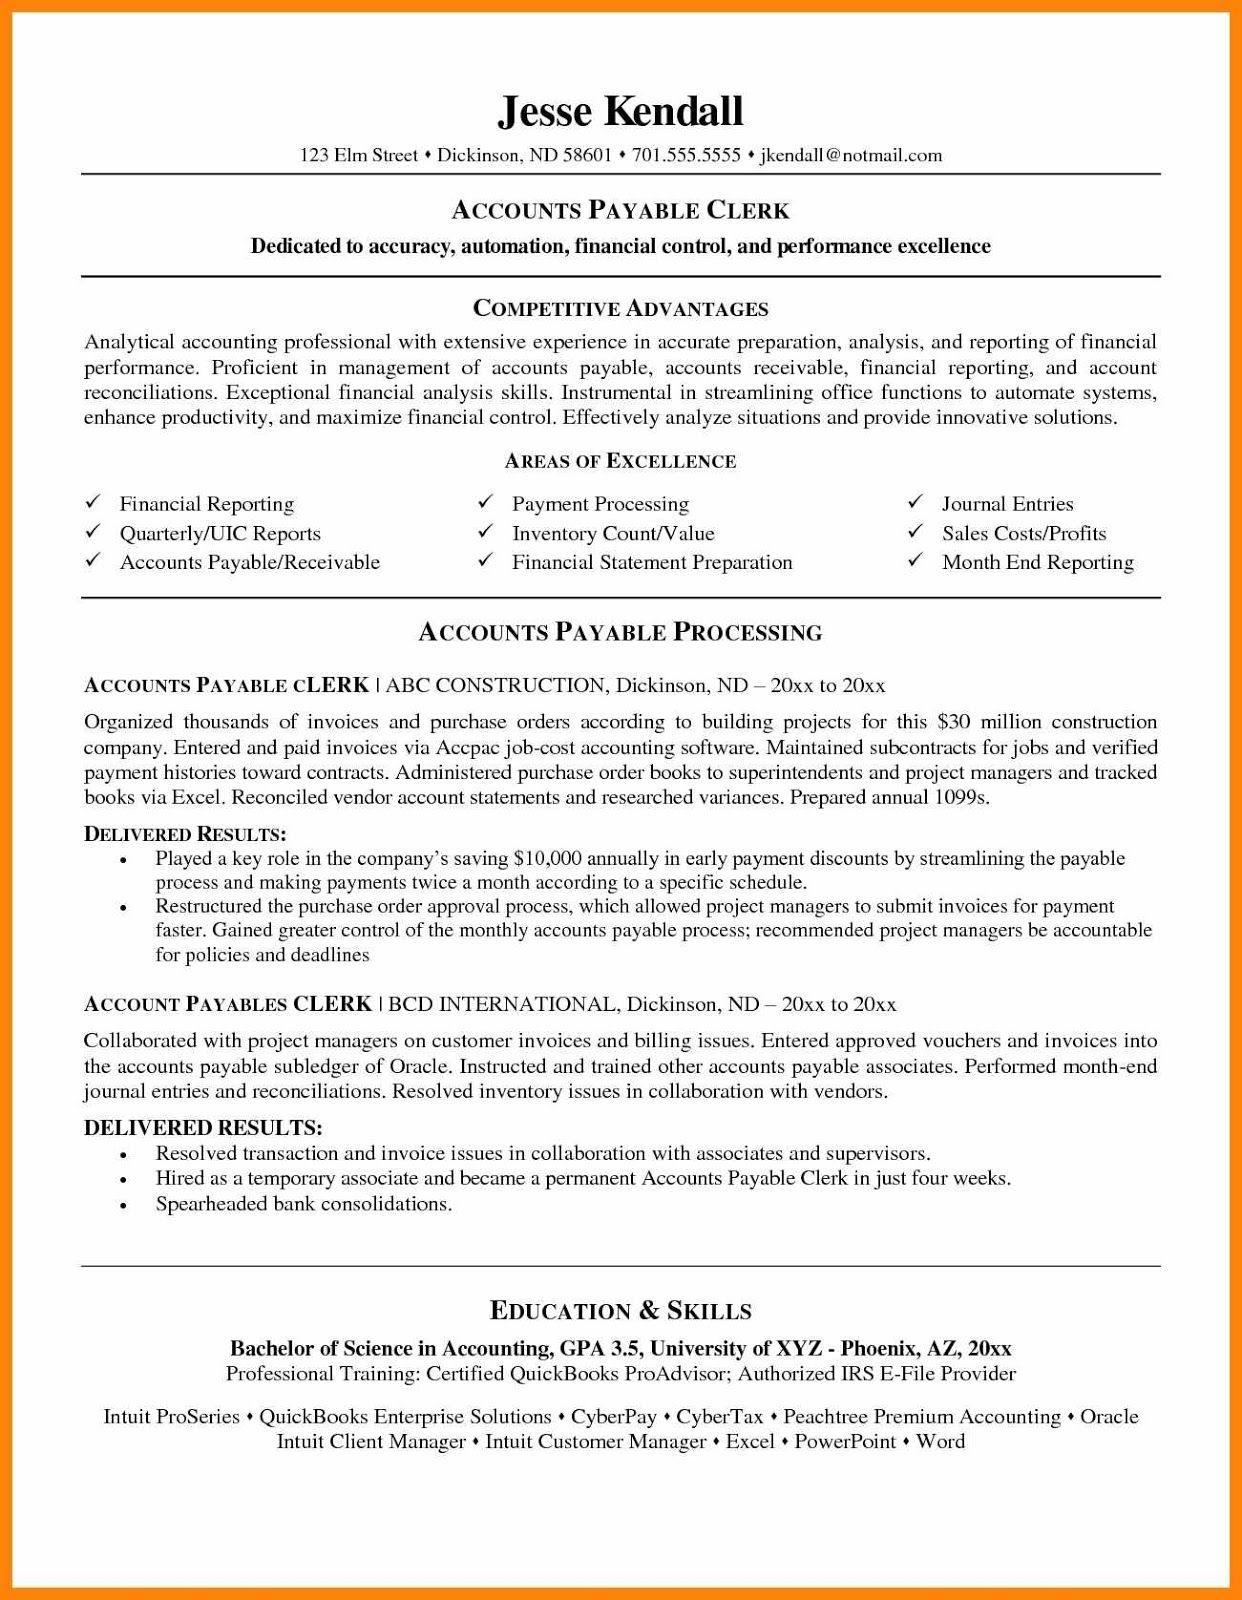 pinlilia zhdanov on work  accountant resume resume